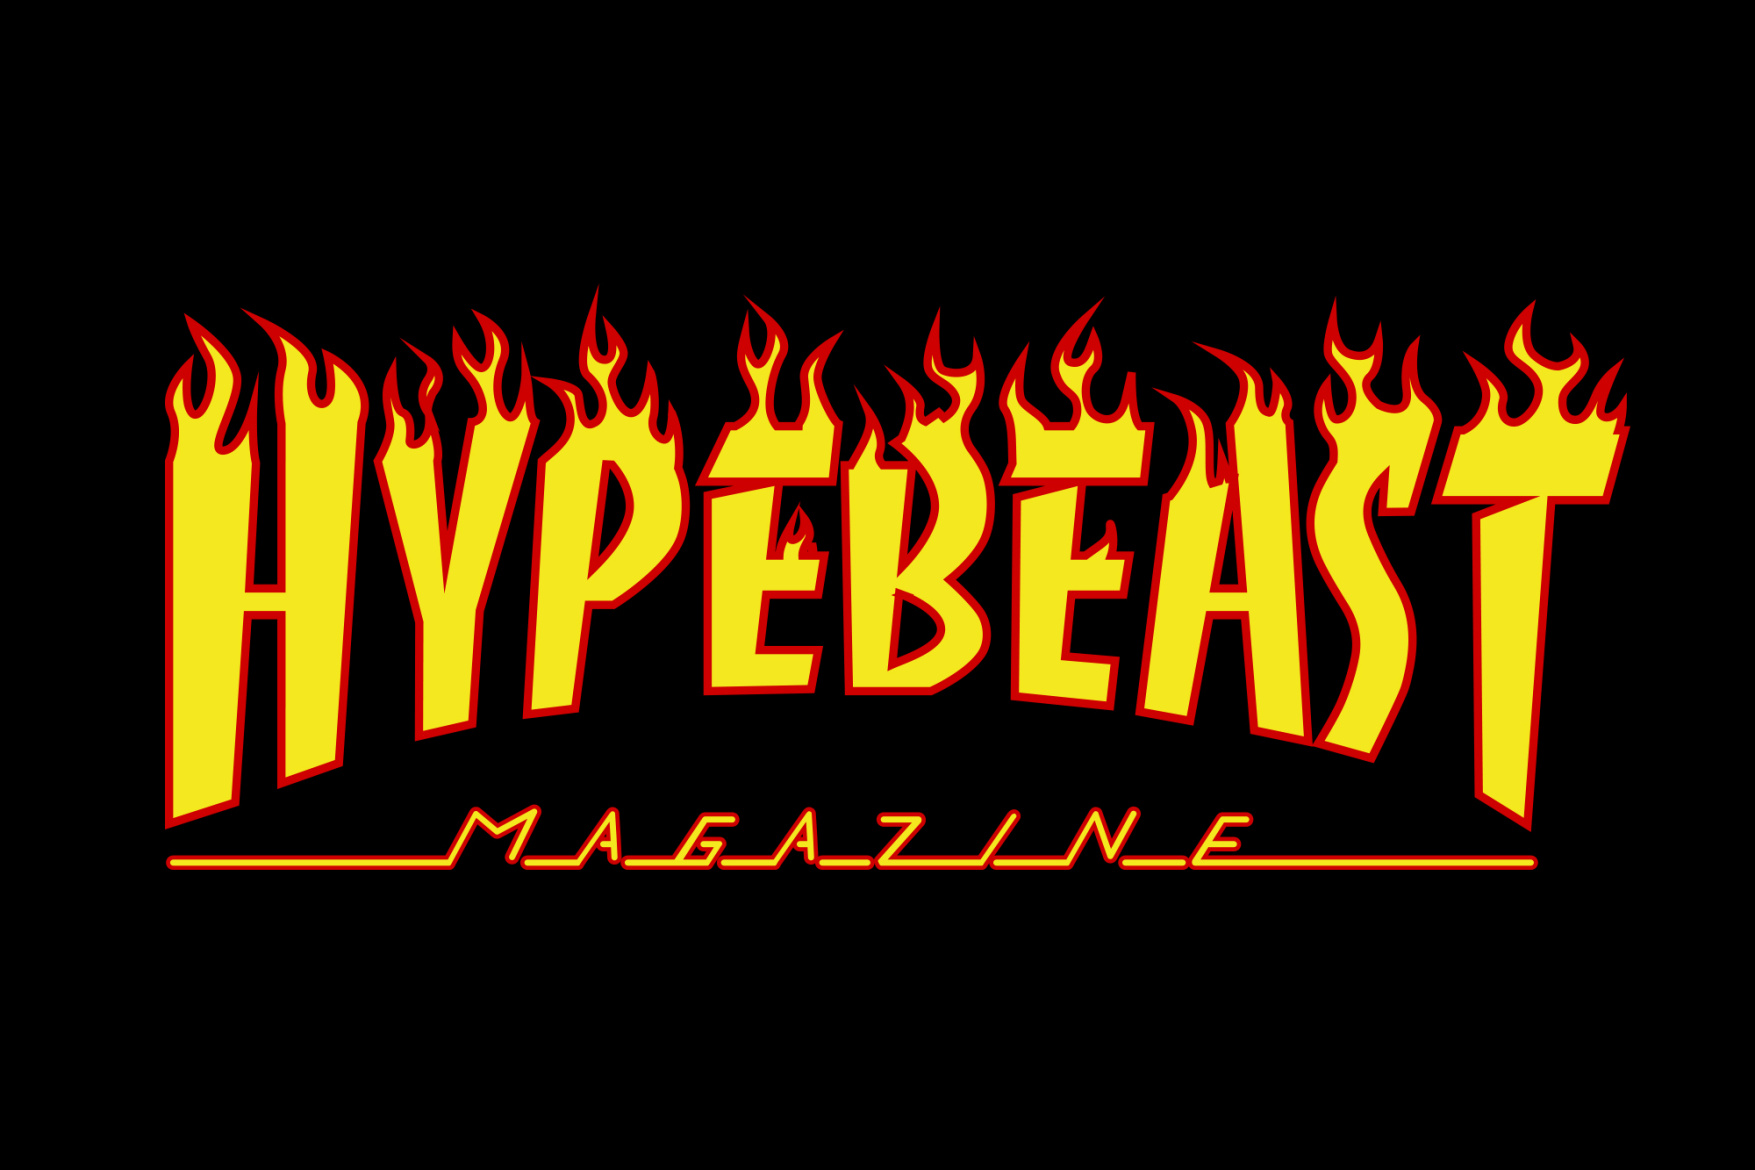 Hypebeast logos